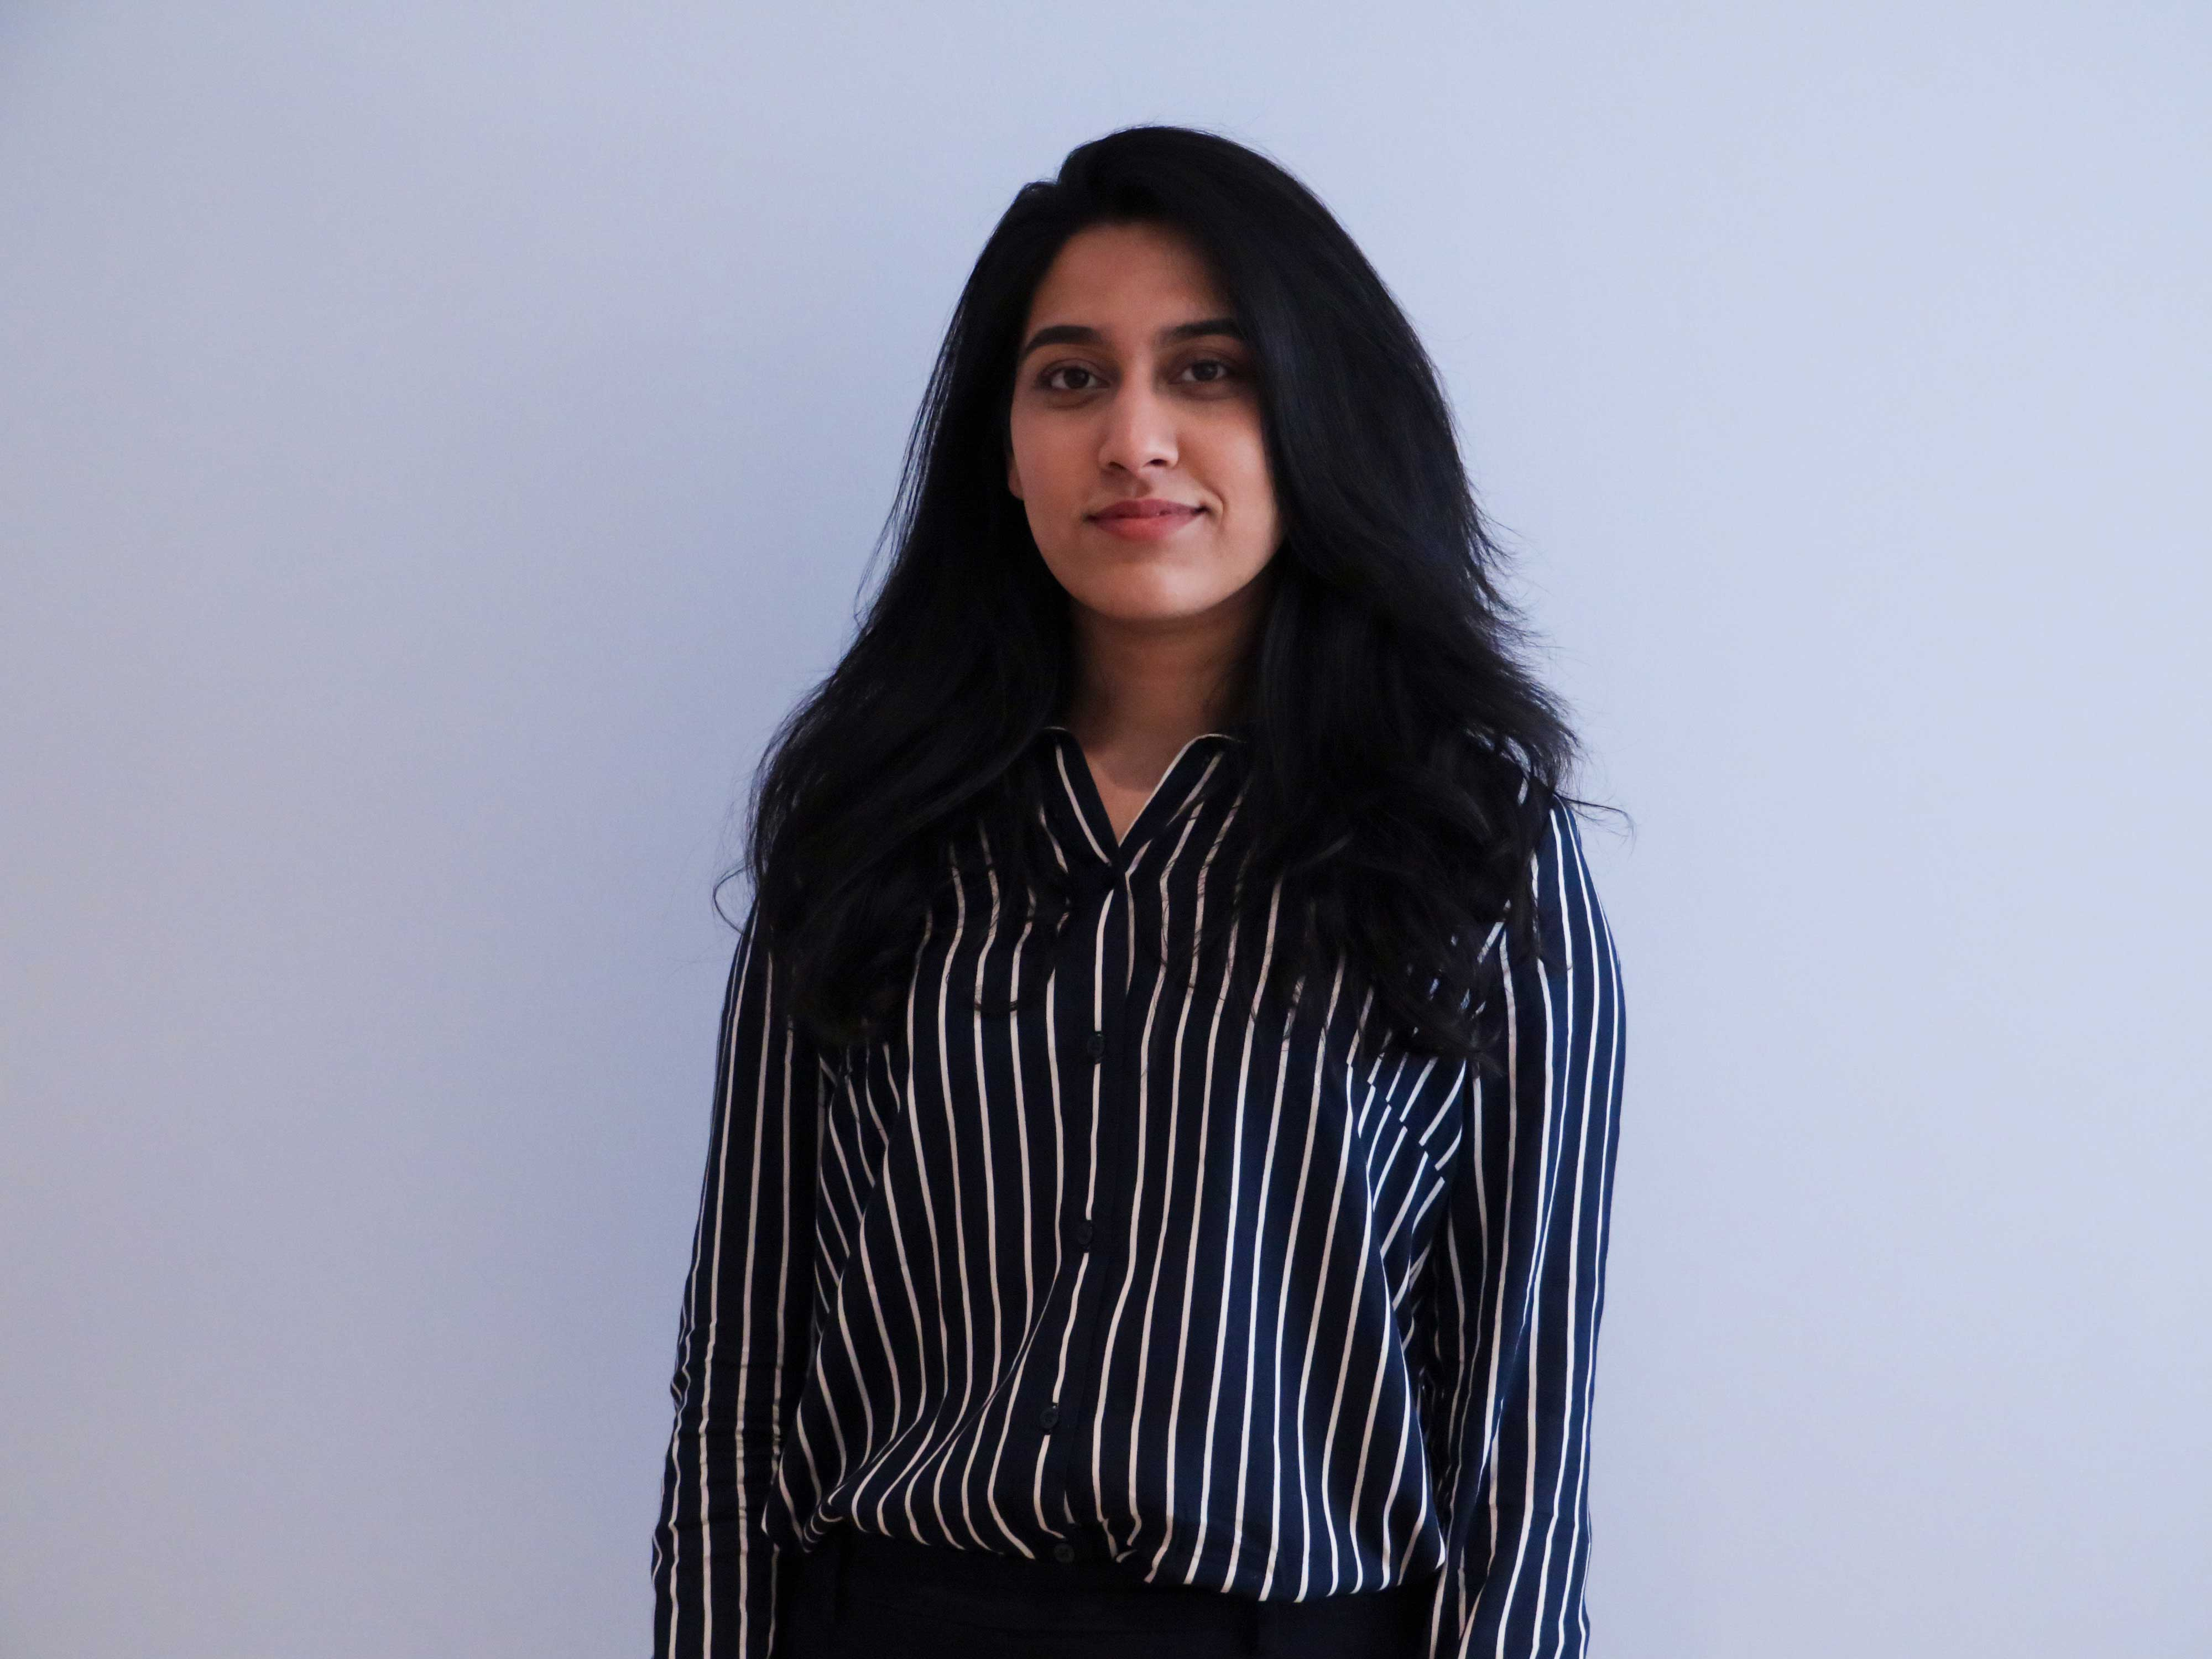 headshot of Ailya Salman in front of blank wall